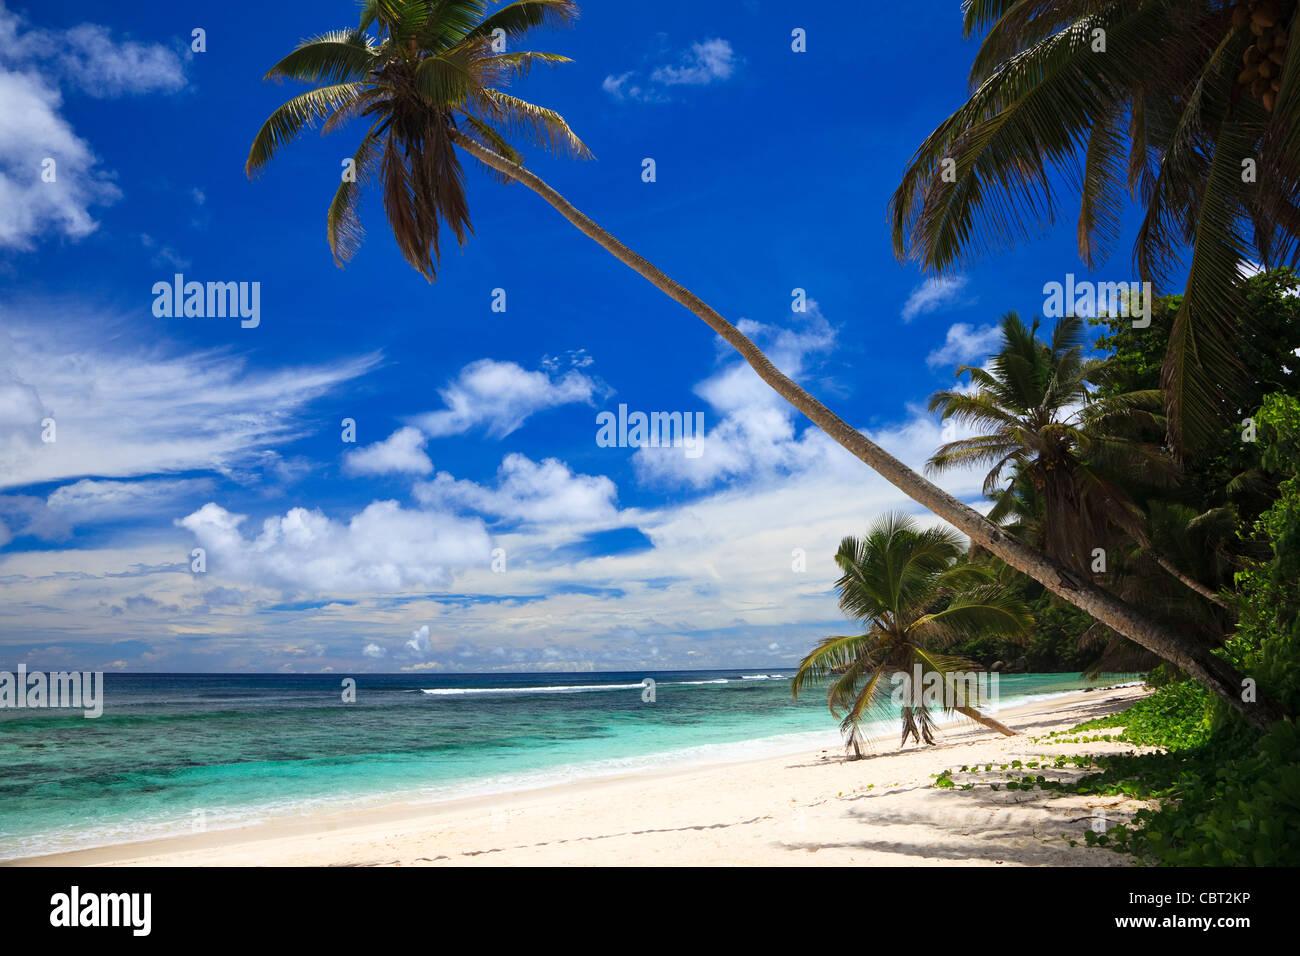 Anse Bougainville beach, Mahe Island, Indian Ocean, Seychelles - Stock Image